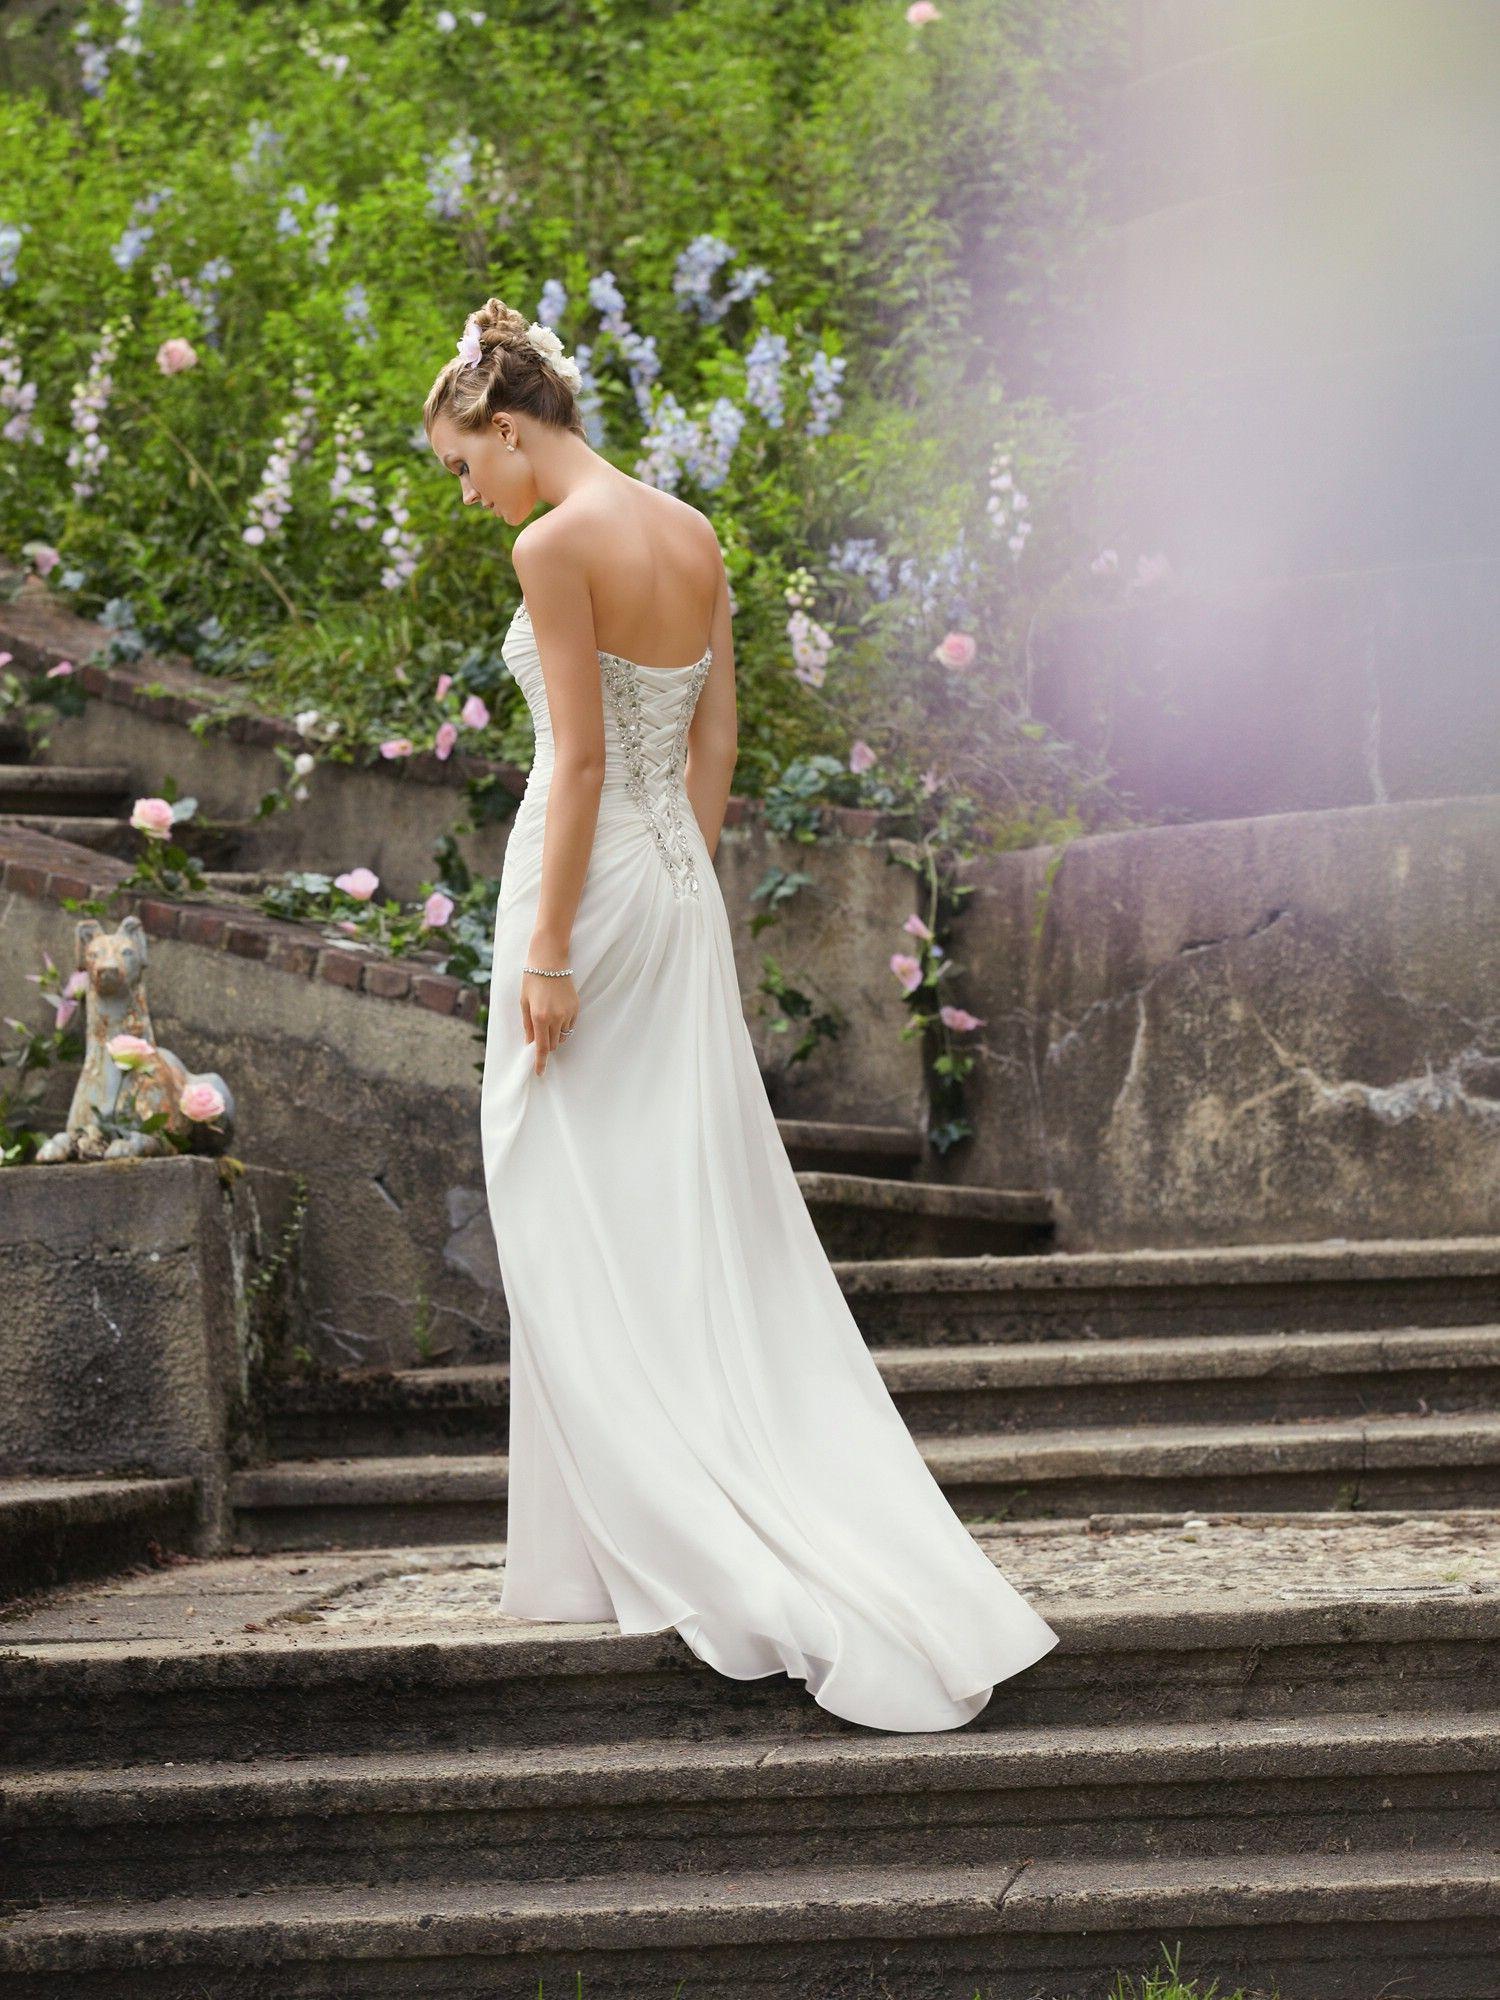 Mori lee wedding dresses style wedding dresses pinterest